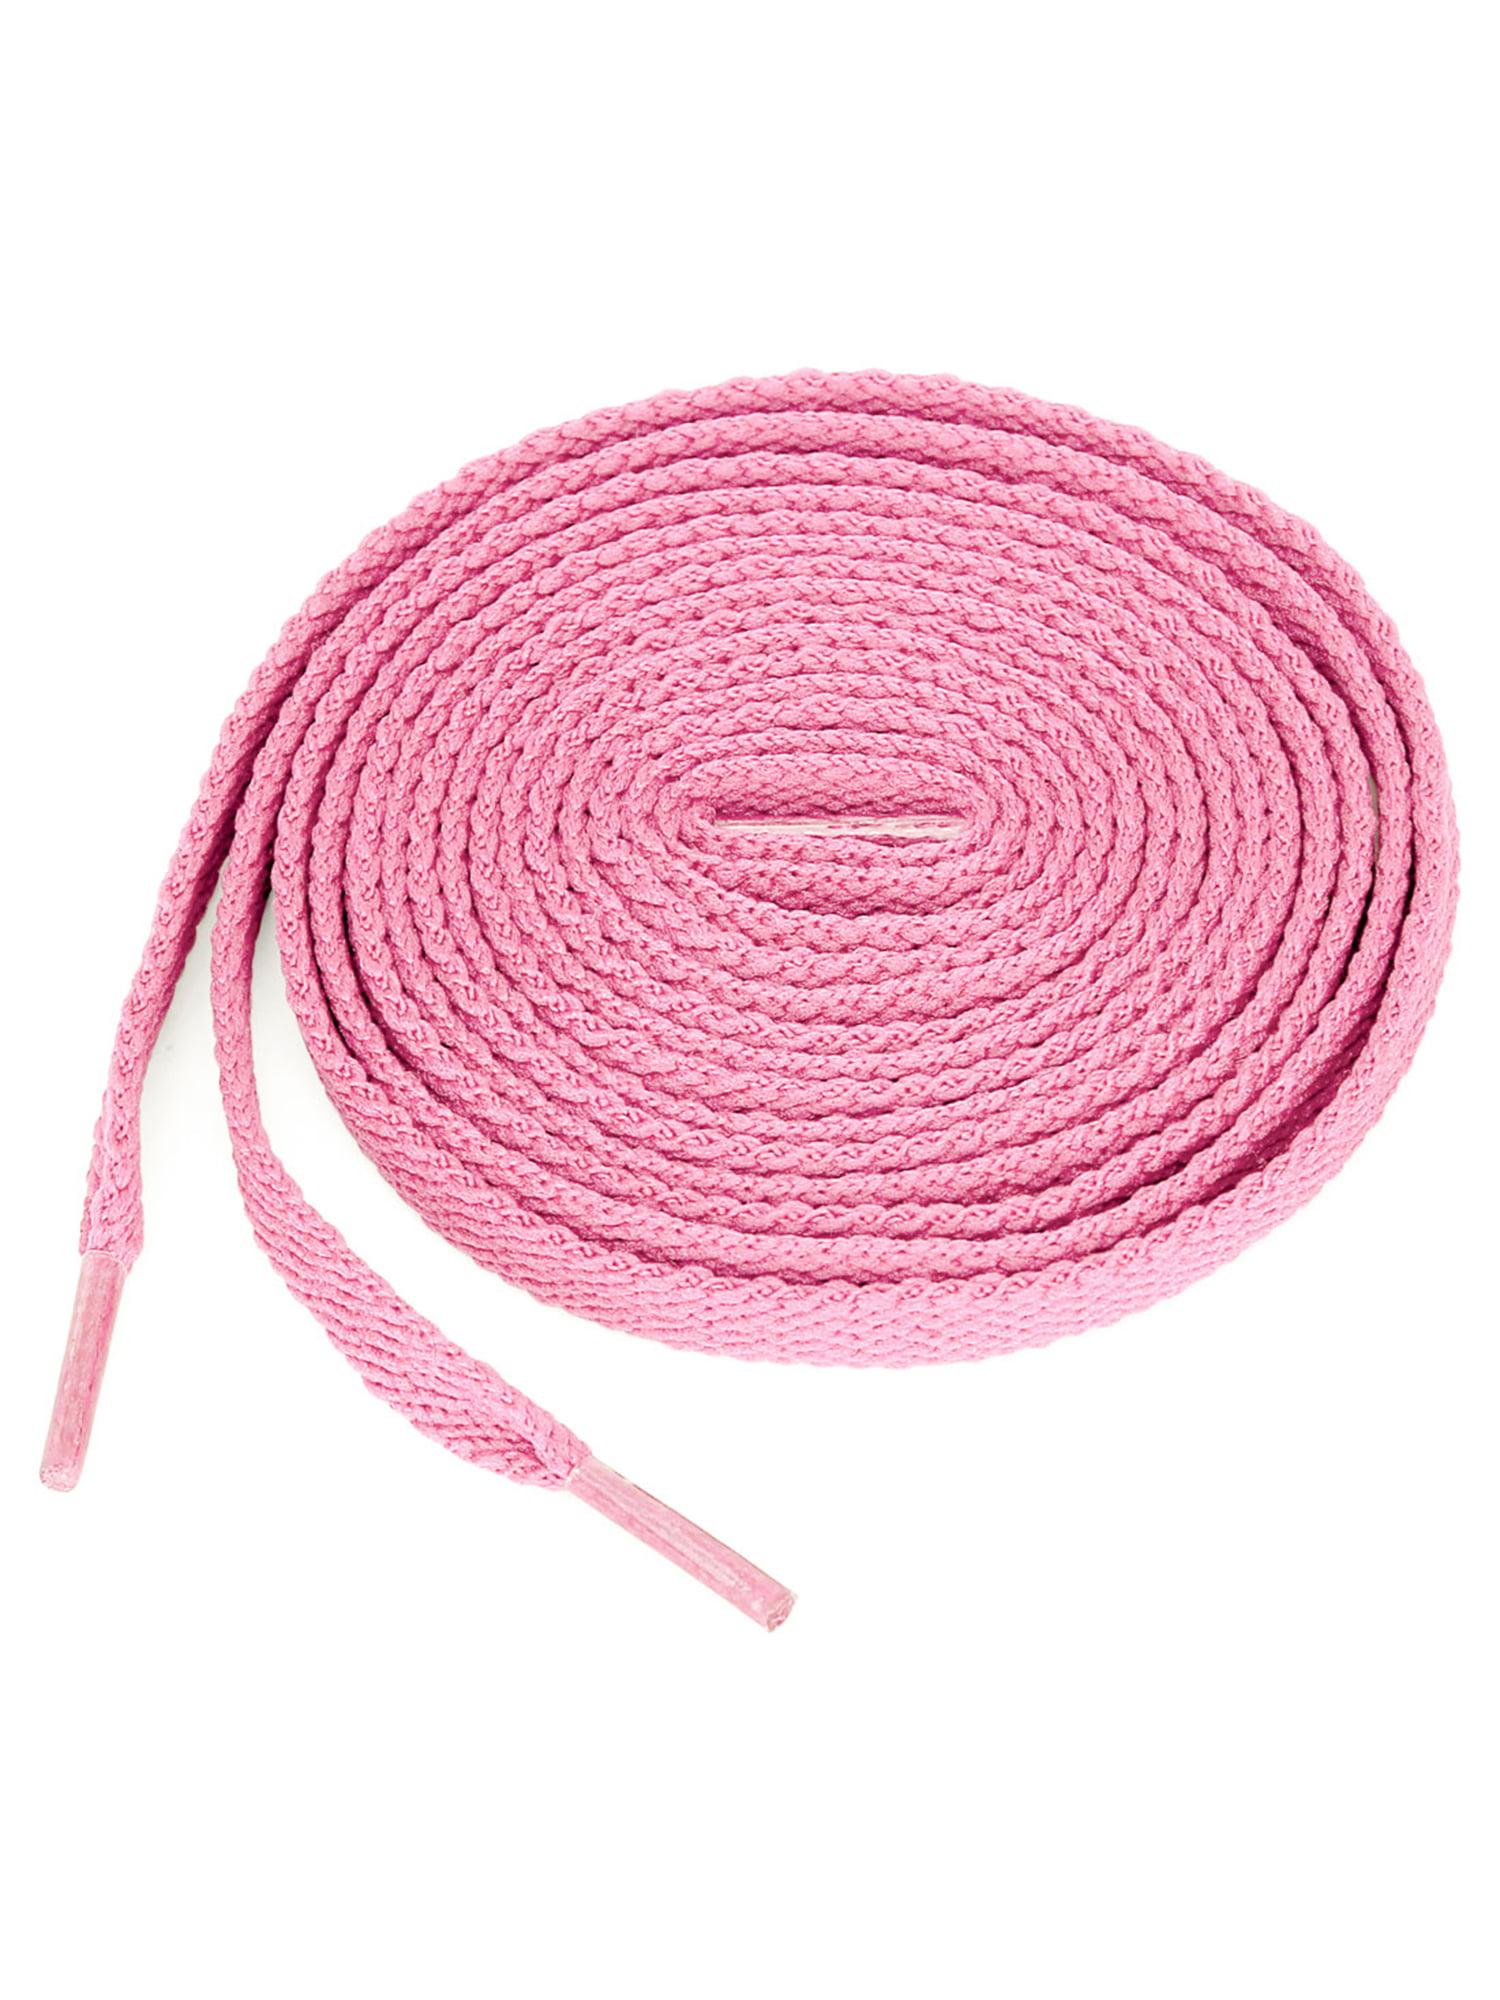 Pink Shoelaces - Walmart.com